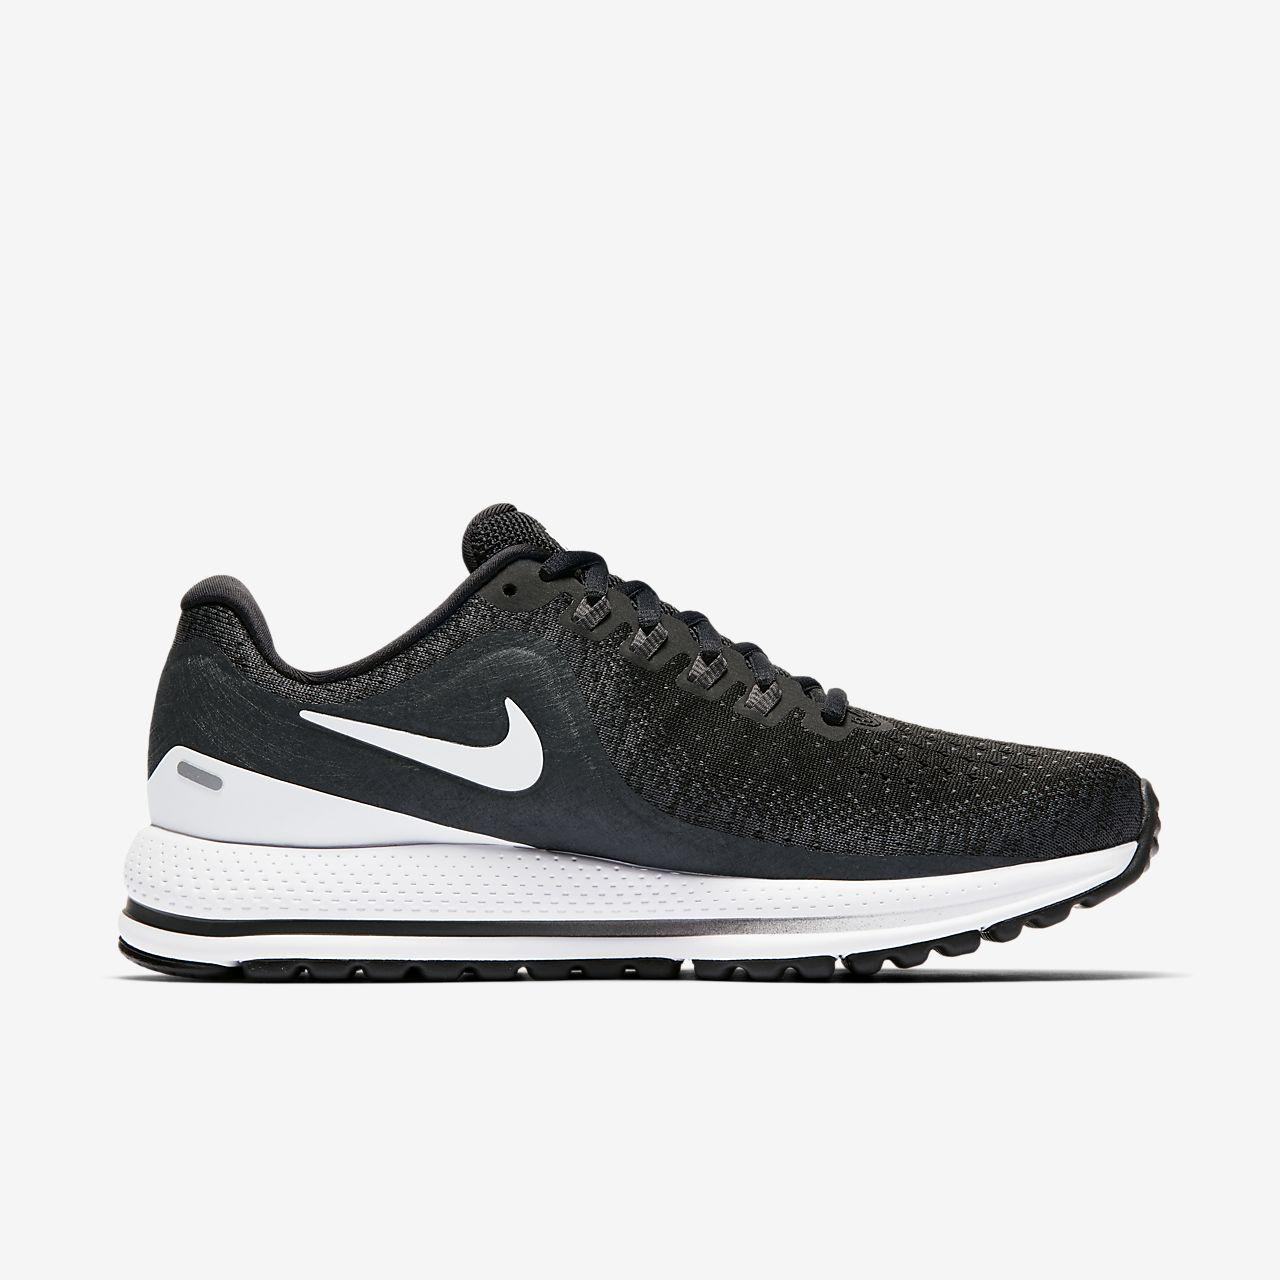 13 Femme Running Nike Pour Chaussure Zoom Vomero Air De GUMqzSVp